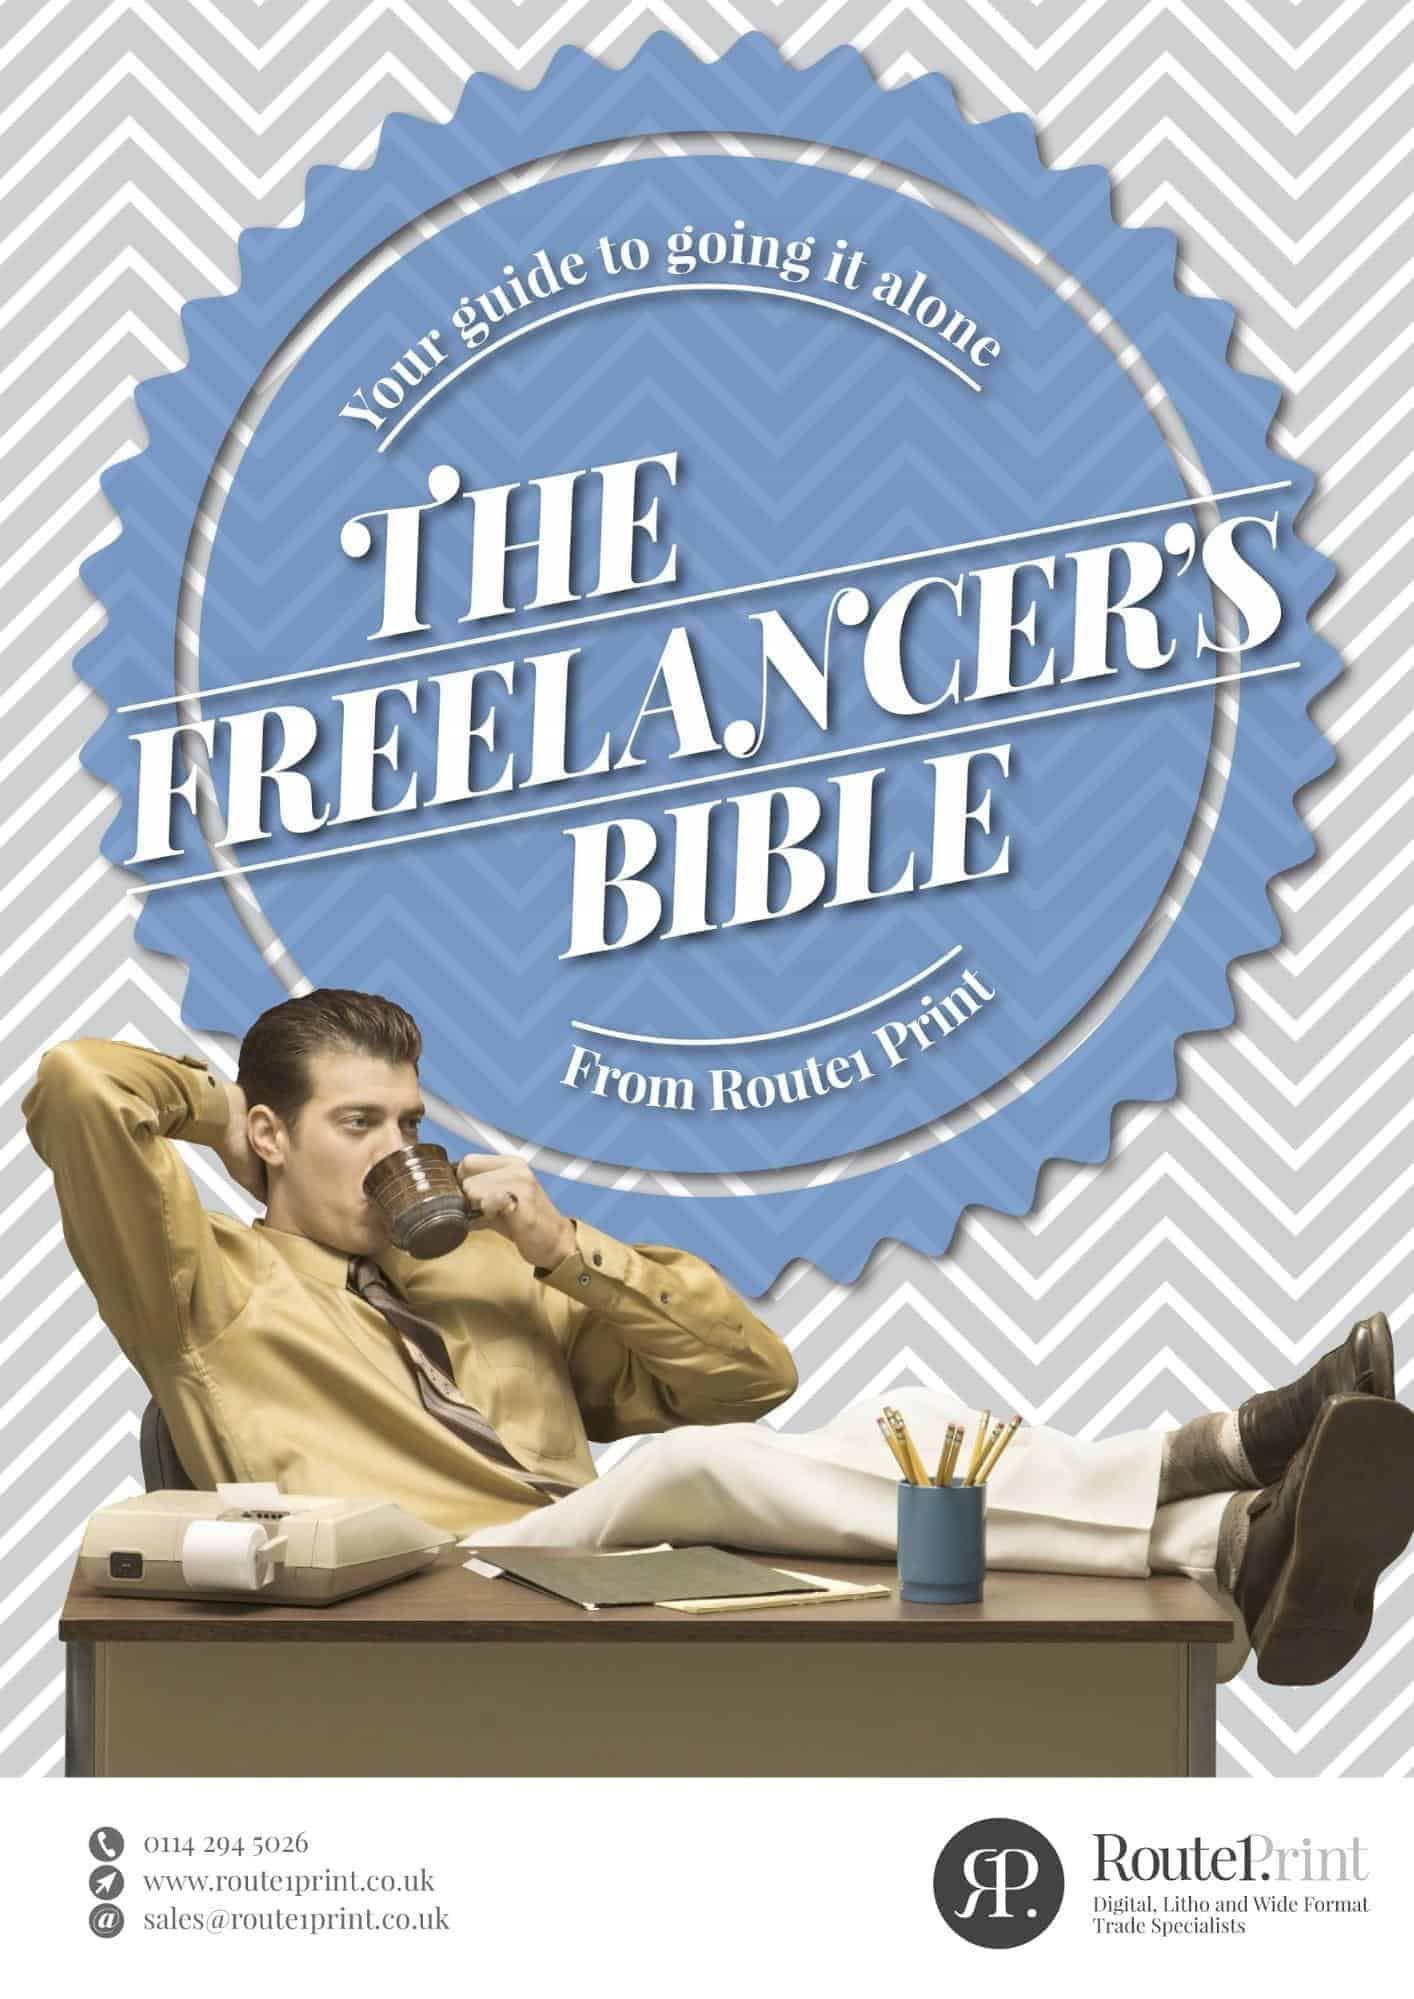 freelancer's bible free ebook, free ebook example